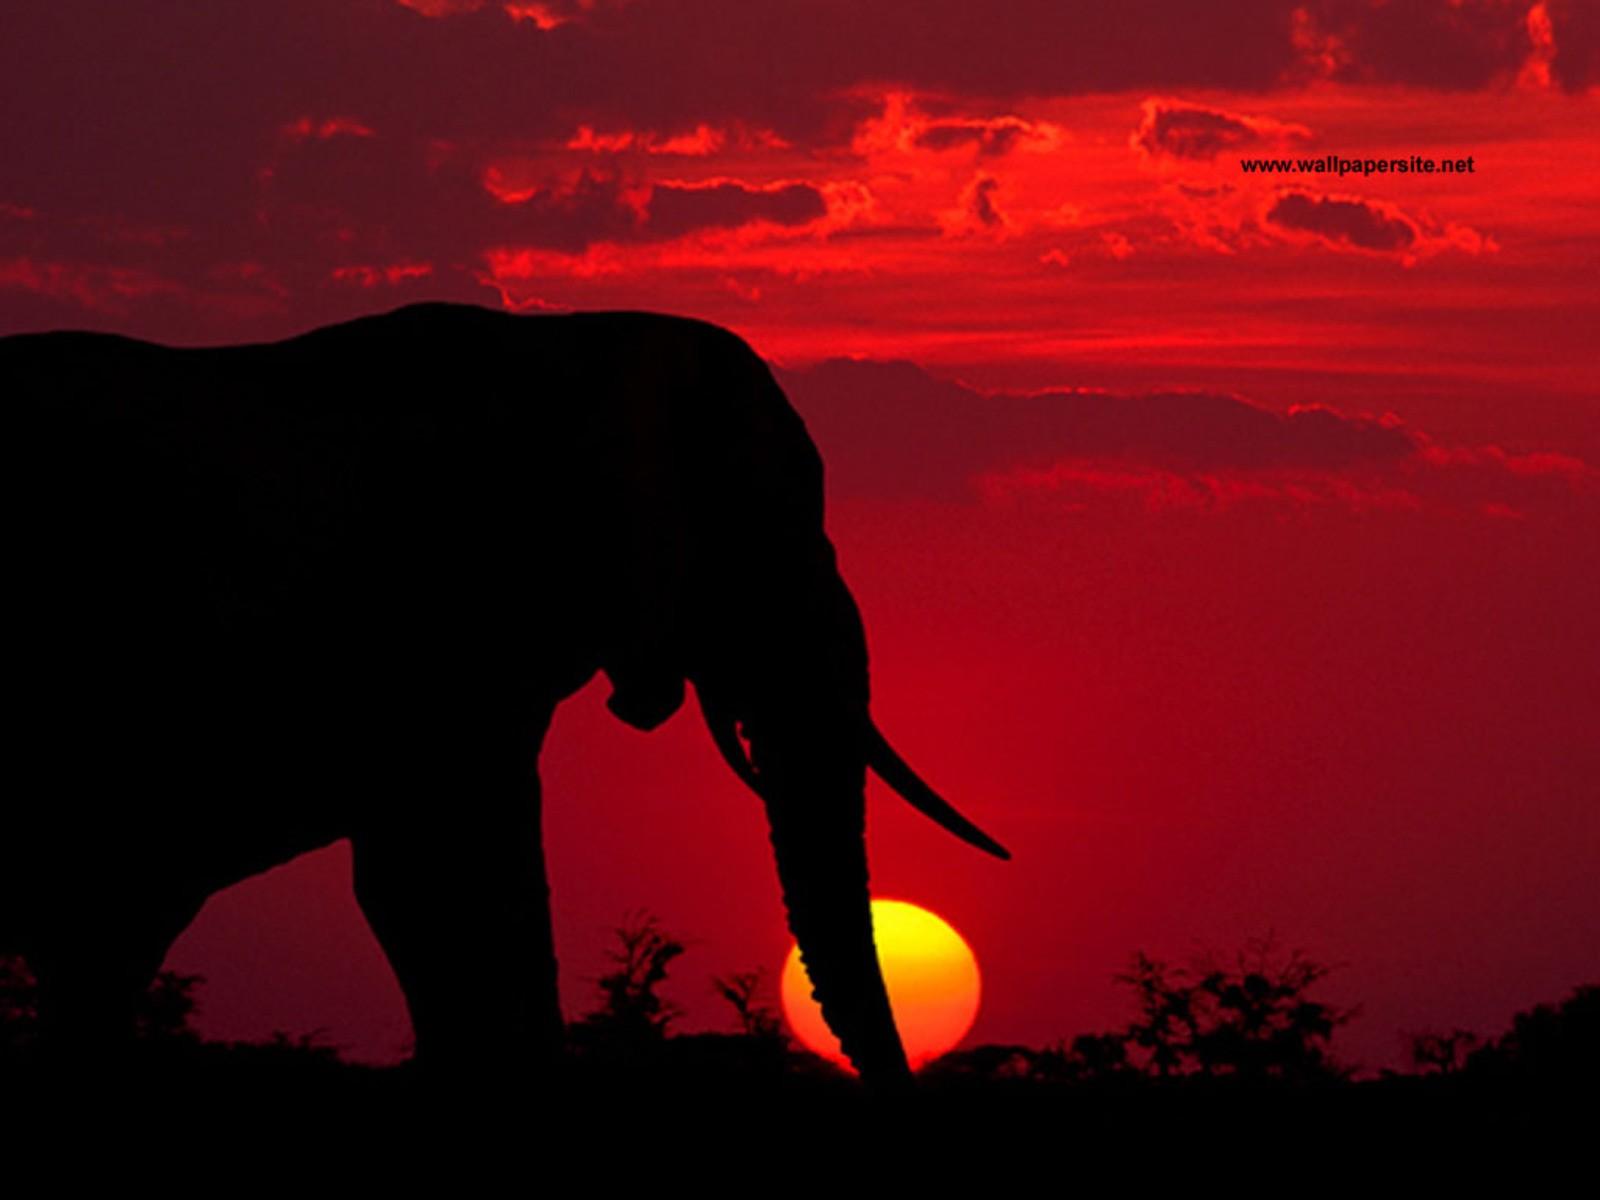 http://1.bp.blogspot.com/-1jmGyYO32EM/UAqu98xQLoI/AAAAAAAABGc/l7qodNQrkxE/s1600/gambar-untuk-gajah-perang.jpg